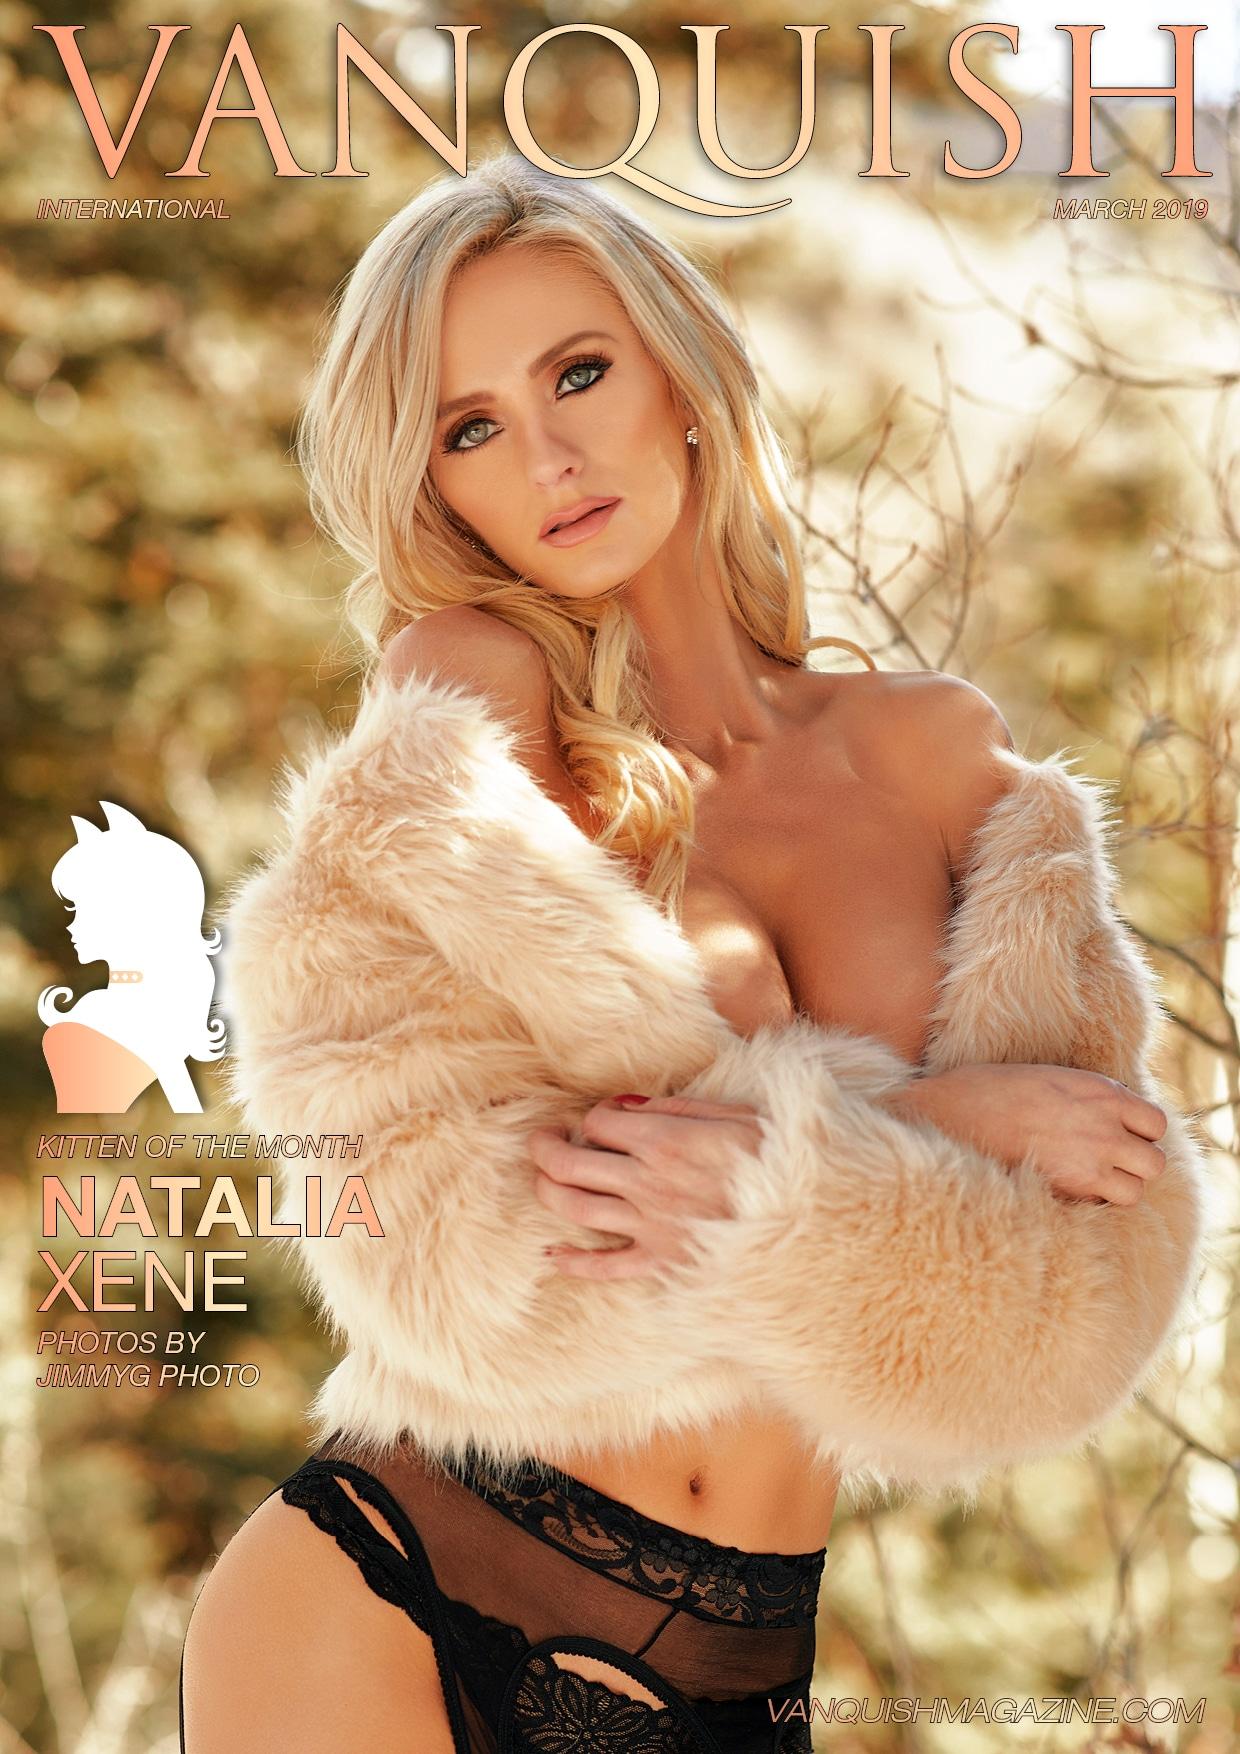 Vanquish Magazine - March 2019 - Natalia Xene 1